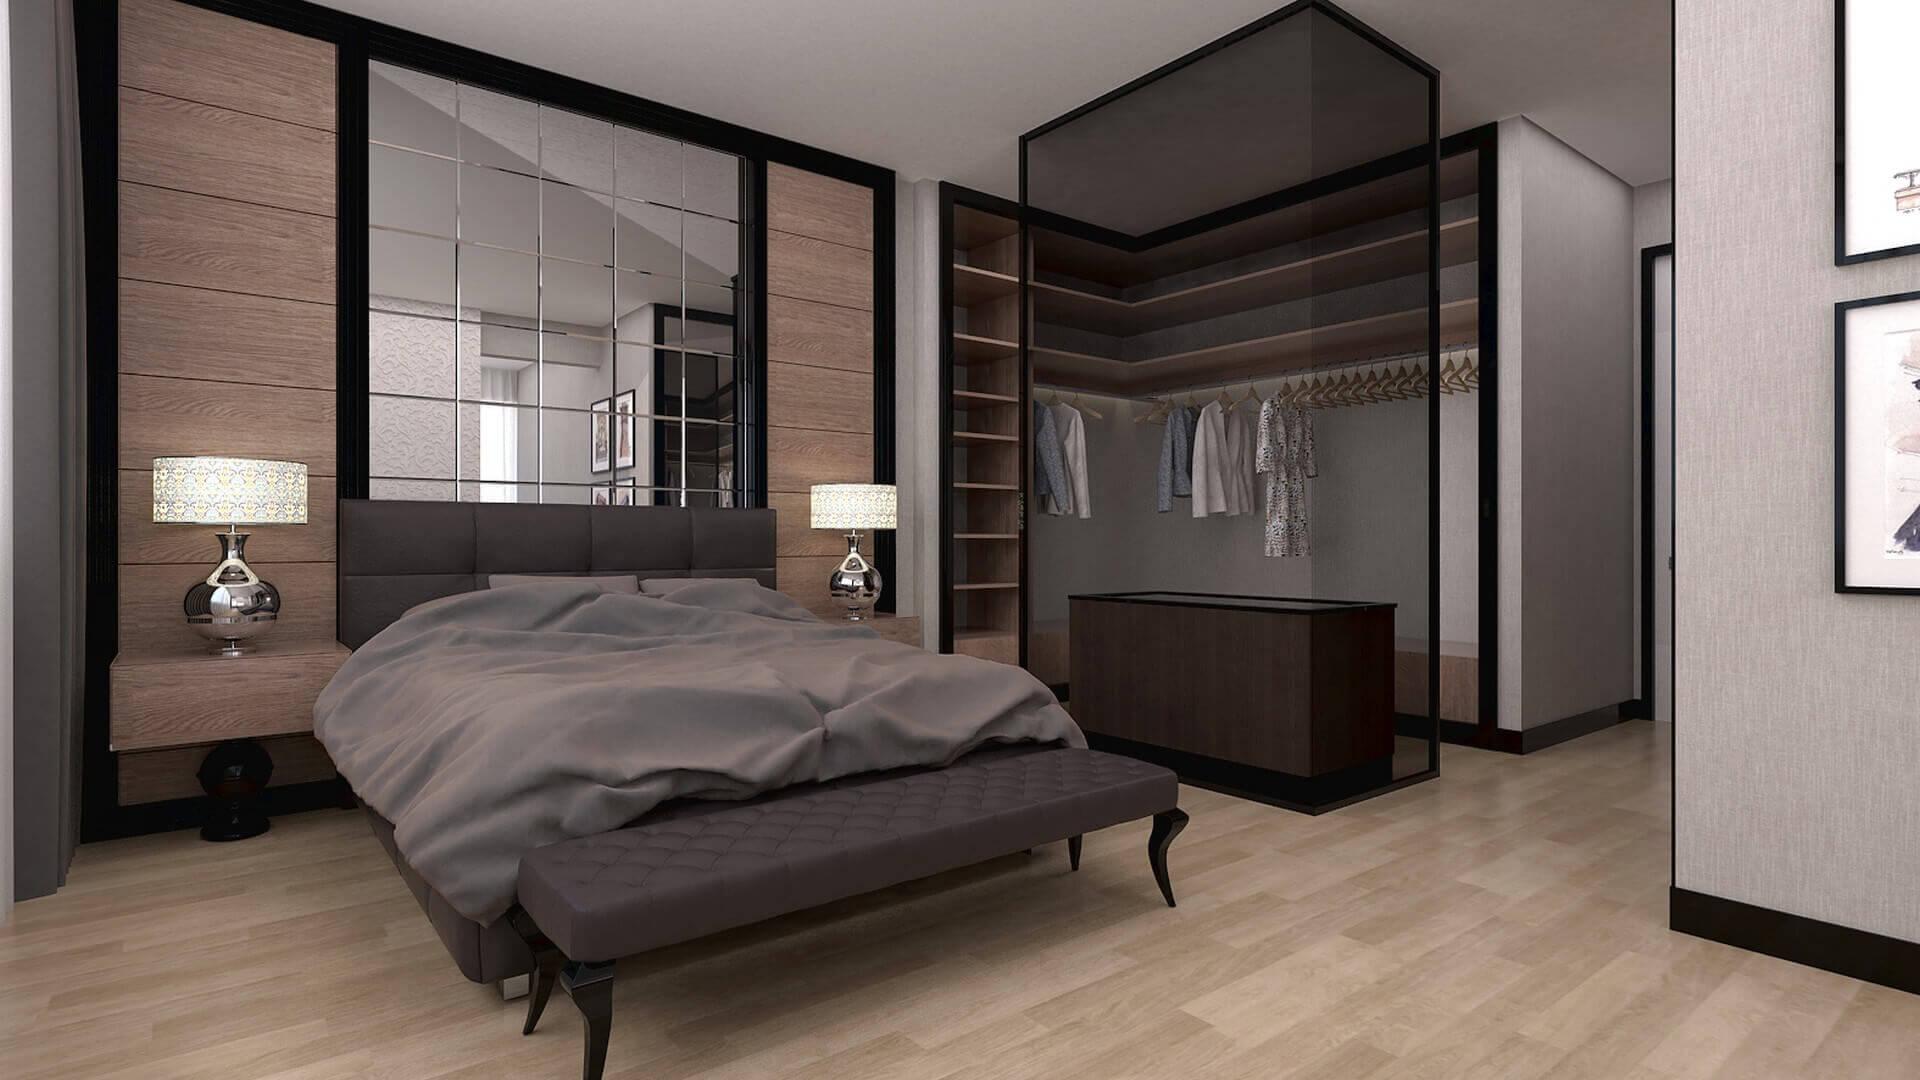 3226 S. Ekinci House Residential